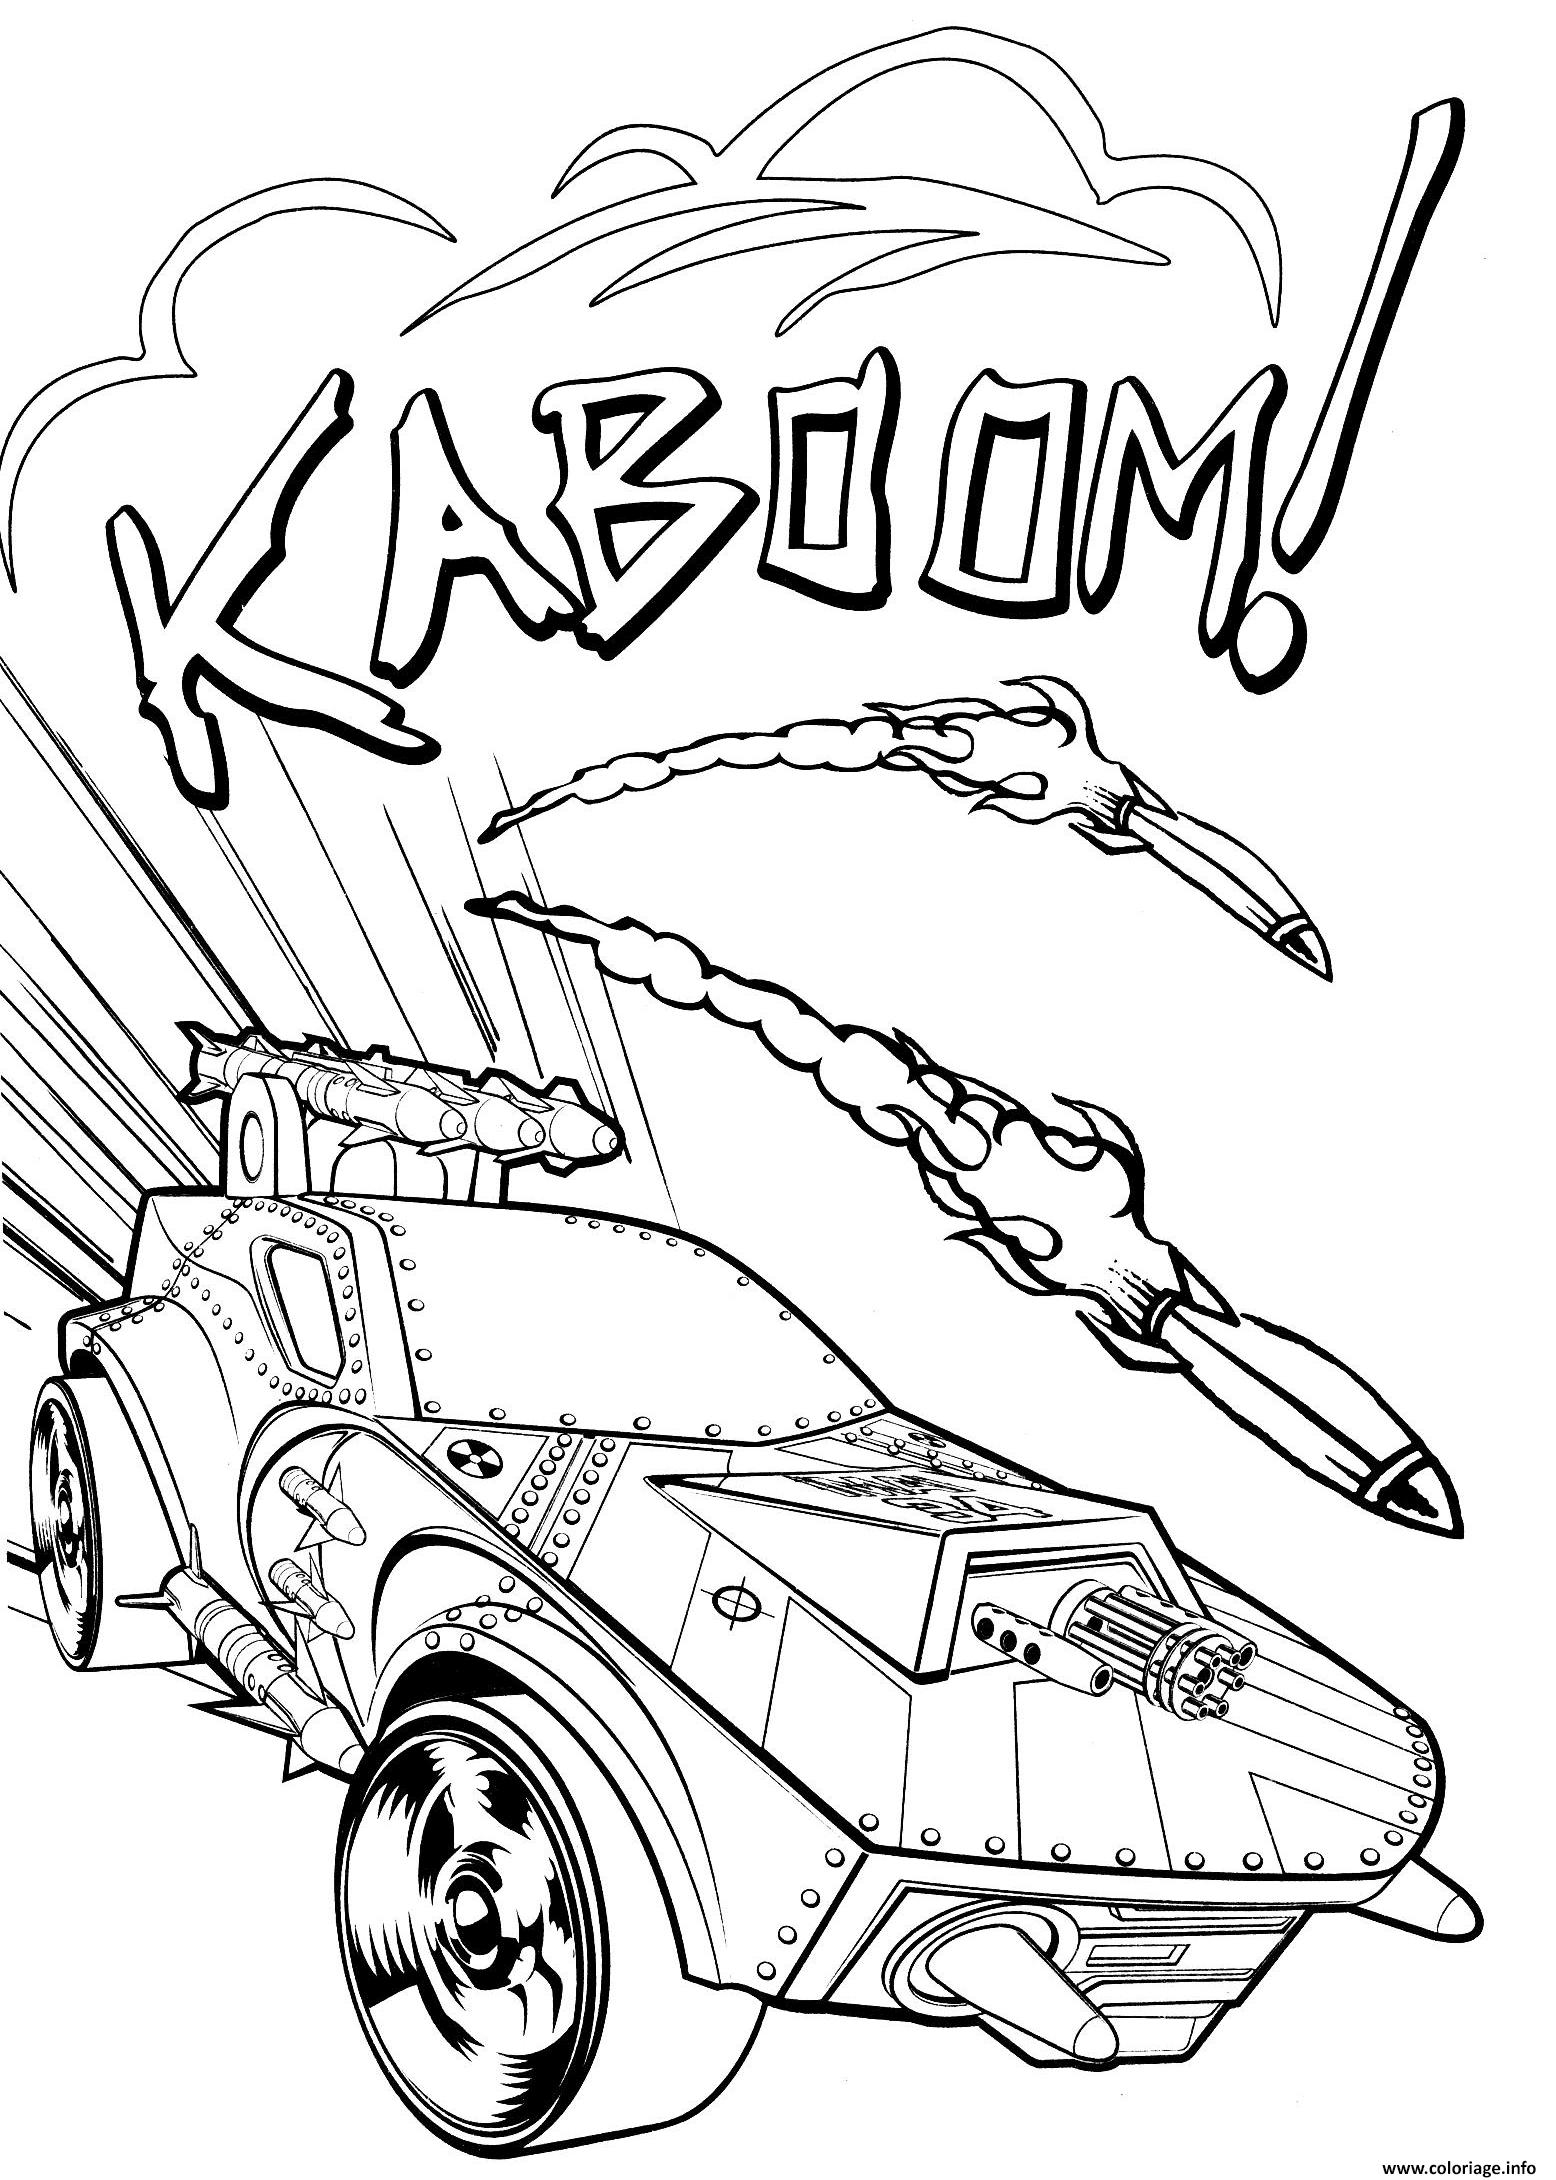 Dessin hot wheels kaboom Coloriage Gratuit à Imprimer